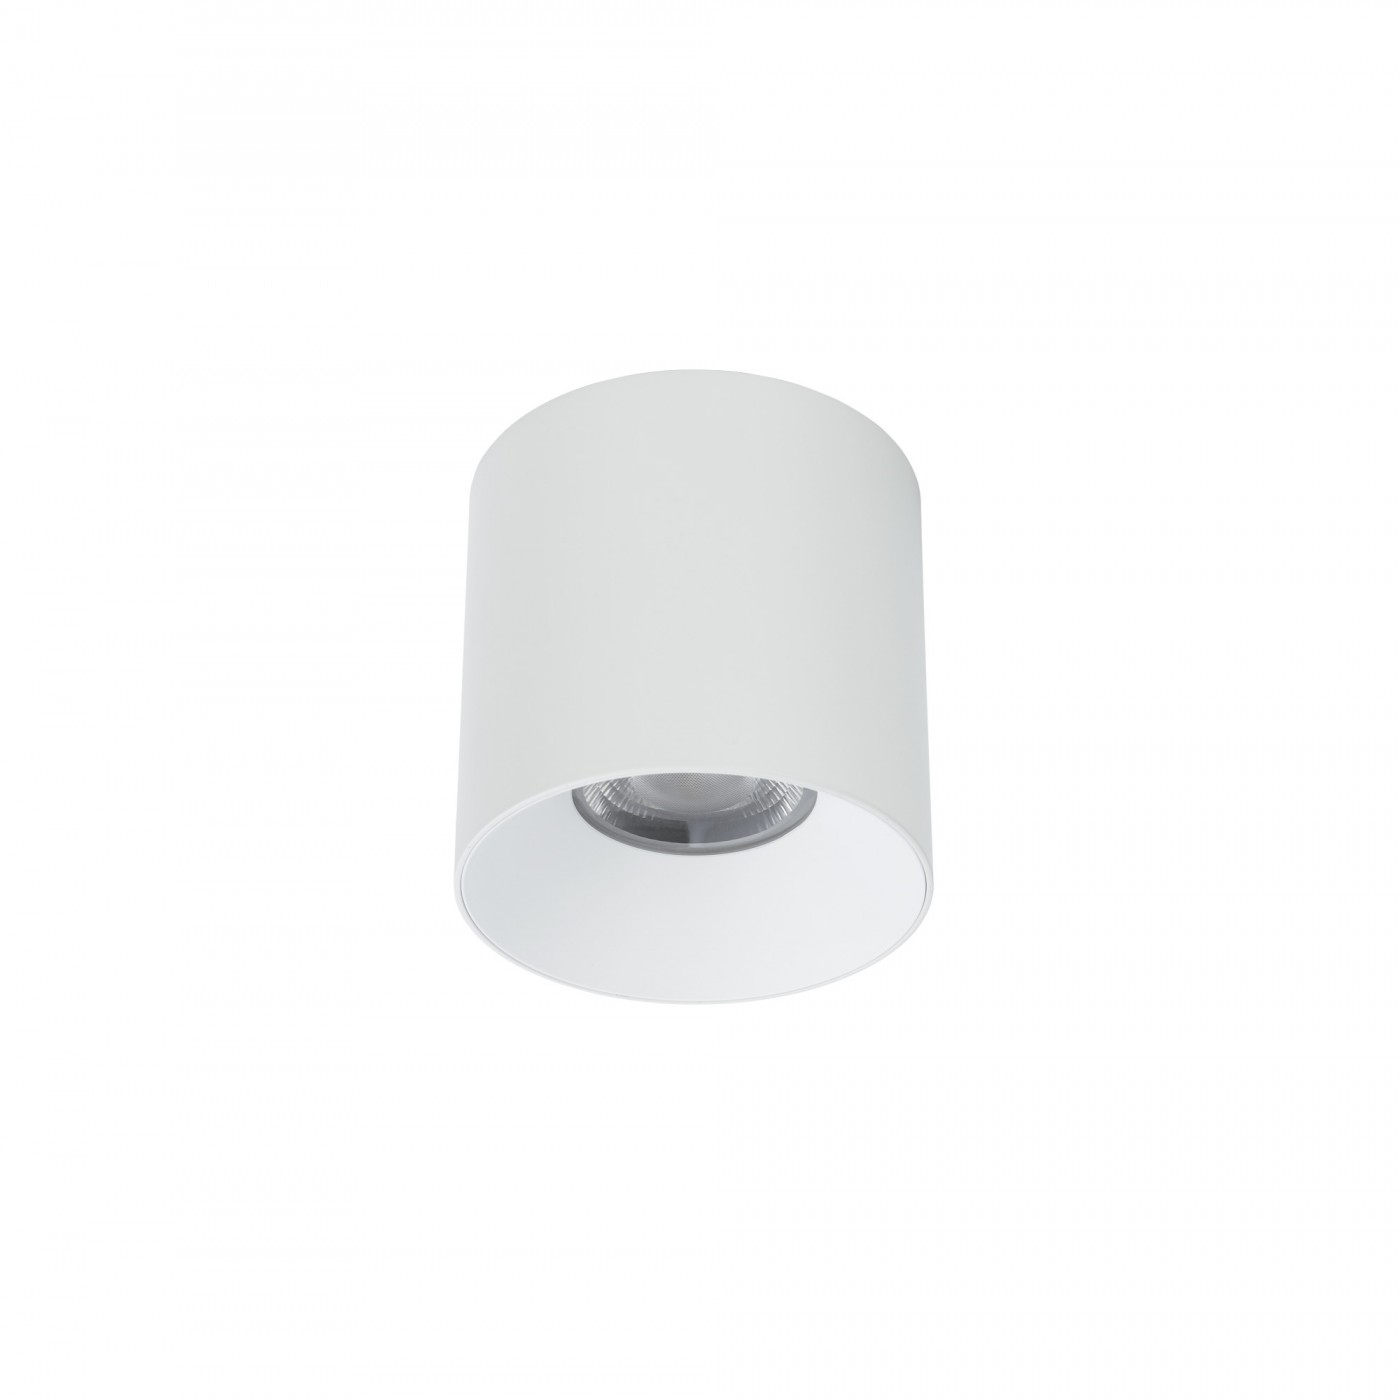 CL IOS LED 30W 4000K white 8734 Nowodvorski Lighting